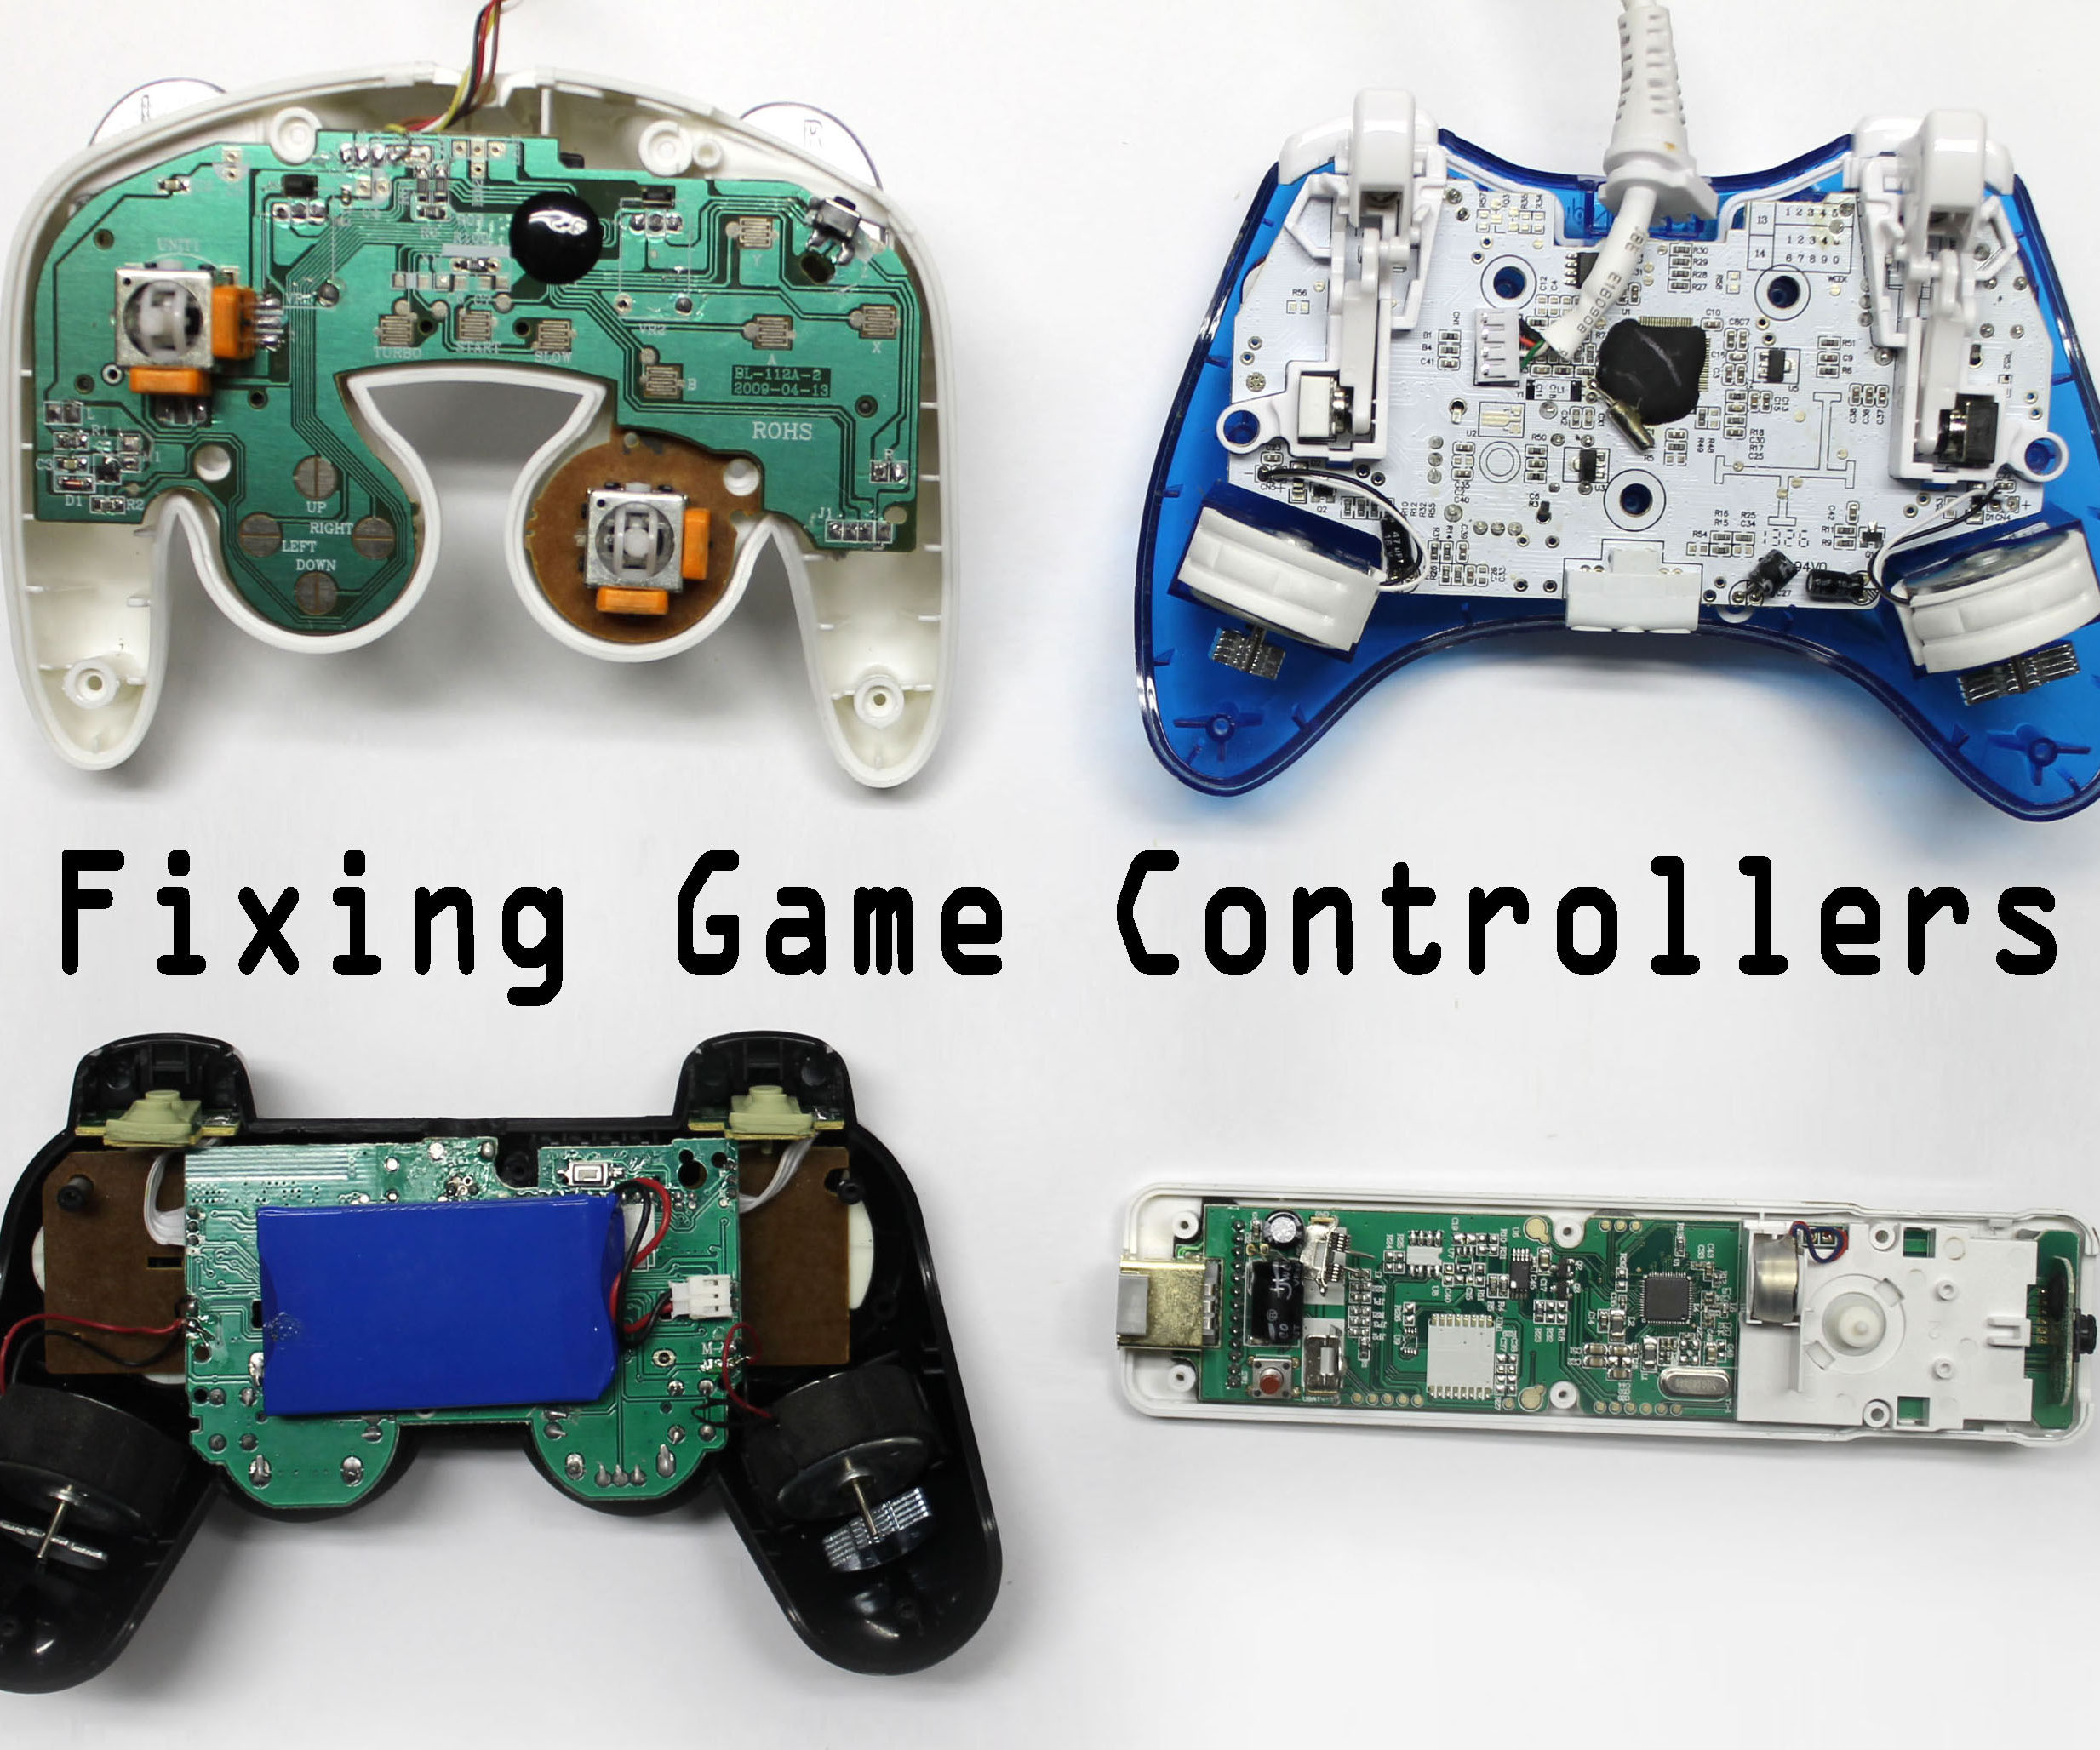 gamecube controller wiring diagram wiring diagram g11 Xbox GameCube Controller Diagram gamecube controller wiring diagram right stick wiring diagram g11 gamecube controller cooling gamecube controller wiring diagram